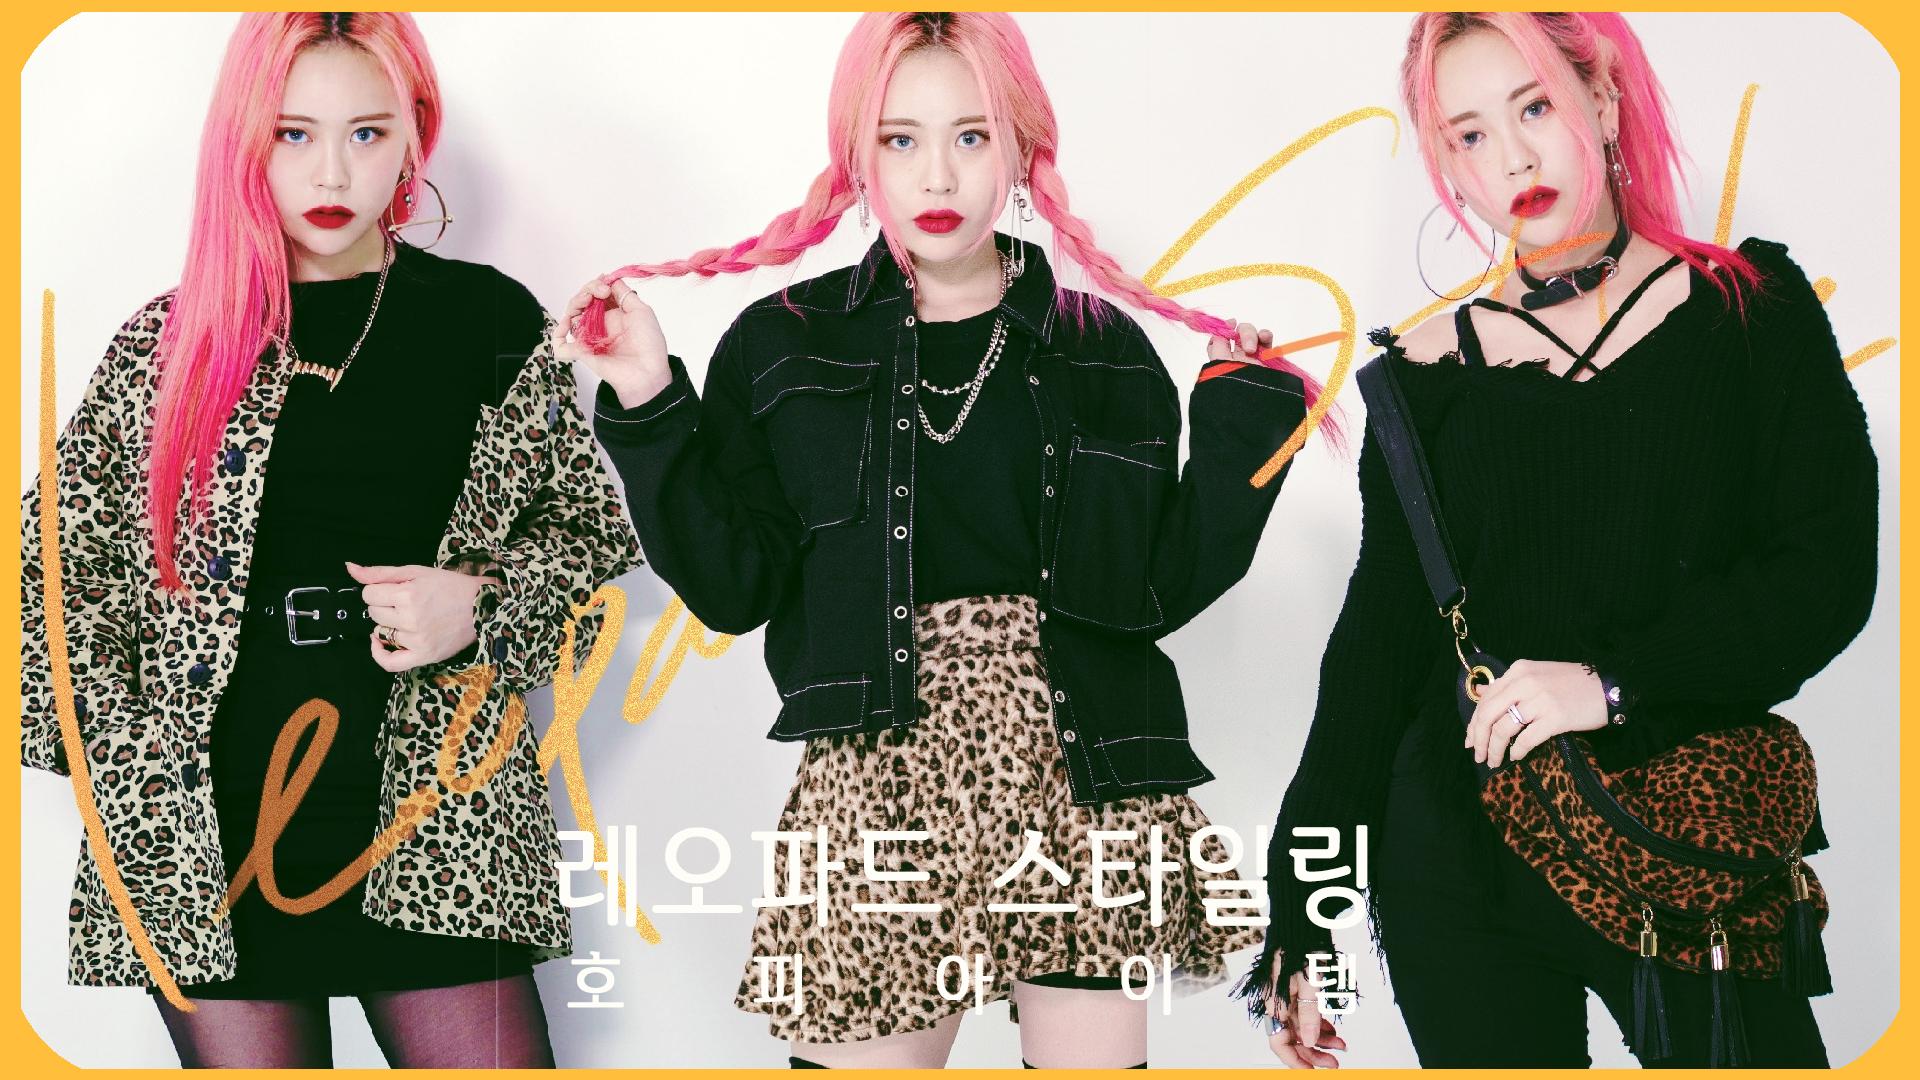 EUNBI✟How to Wear Animal Print | Leopard Print Outfit Ideas 레오파드! 호피무늬 아이템 코디 방법